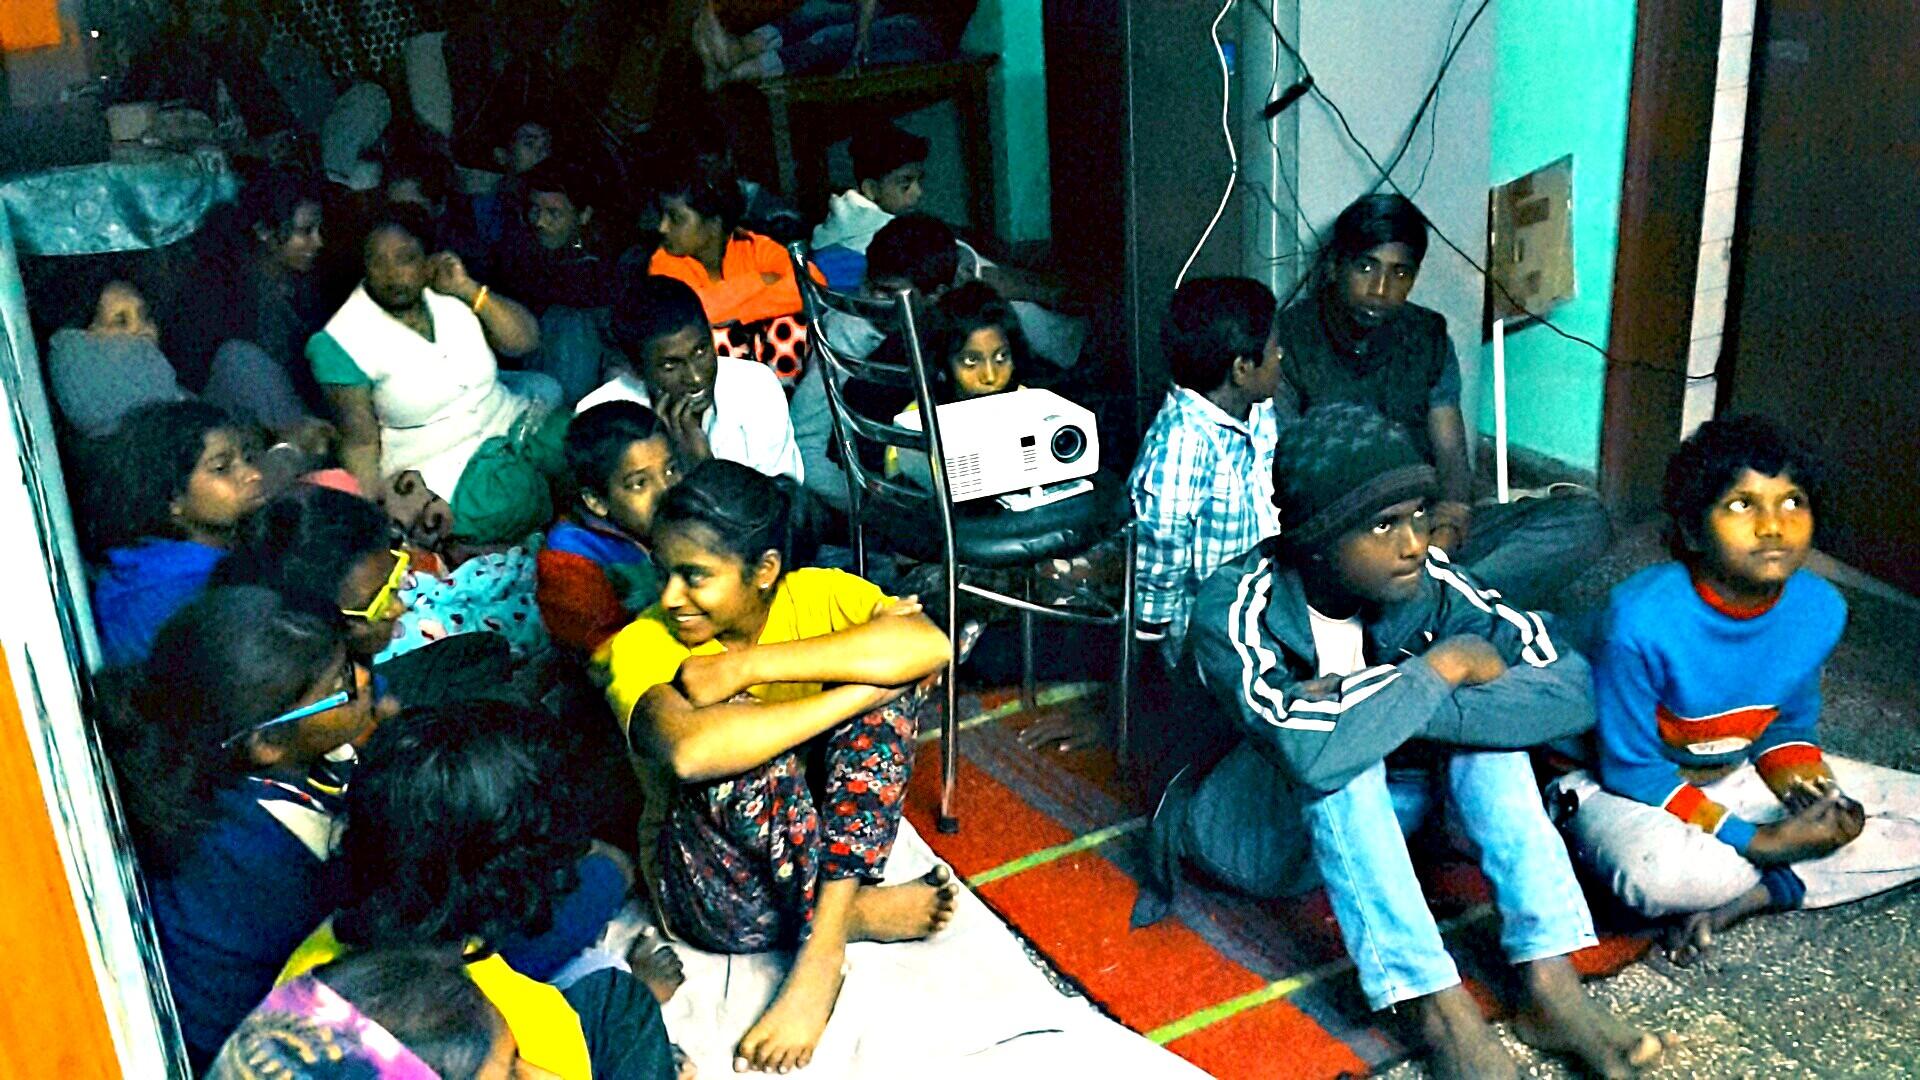 Adolescents attending the film screening